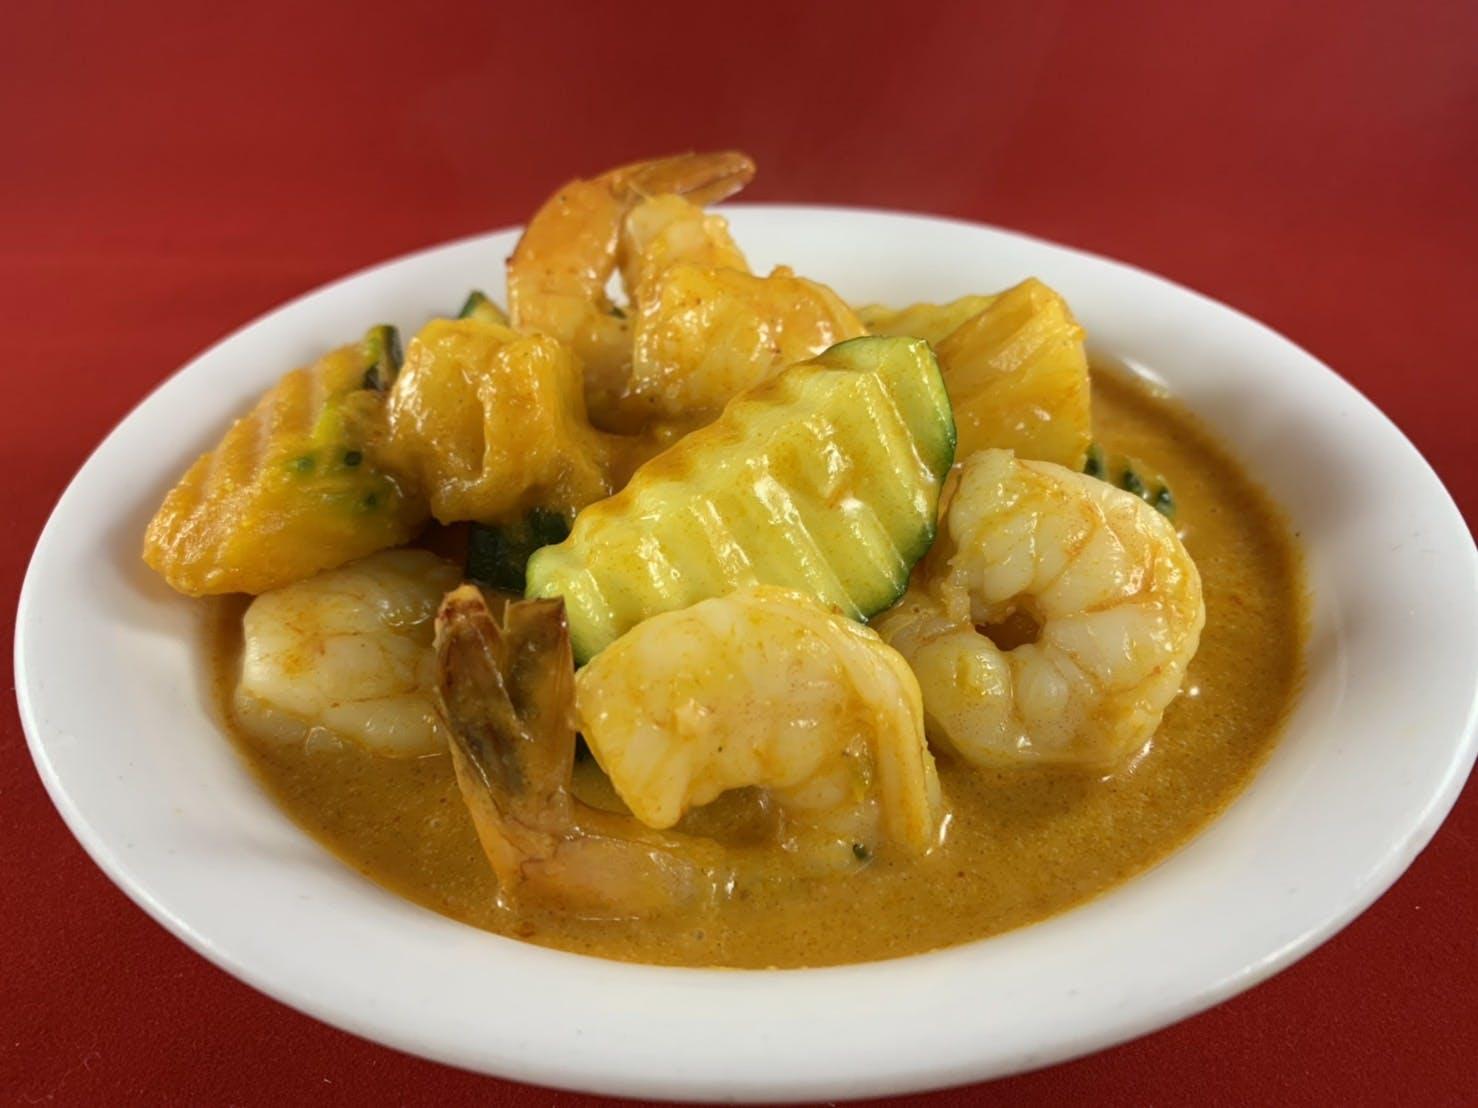 45. Gaeng Kua (Dinner) from Sa-Bai Thong - University Ave in Madison, WI